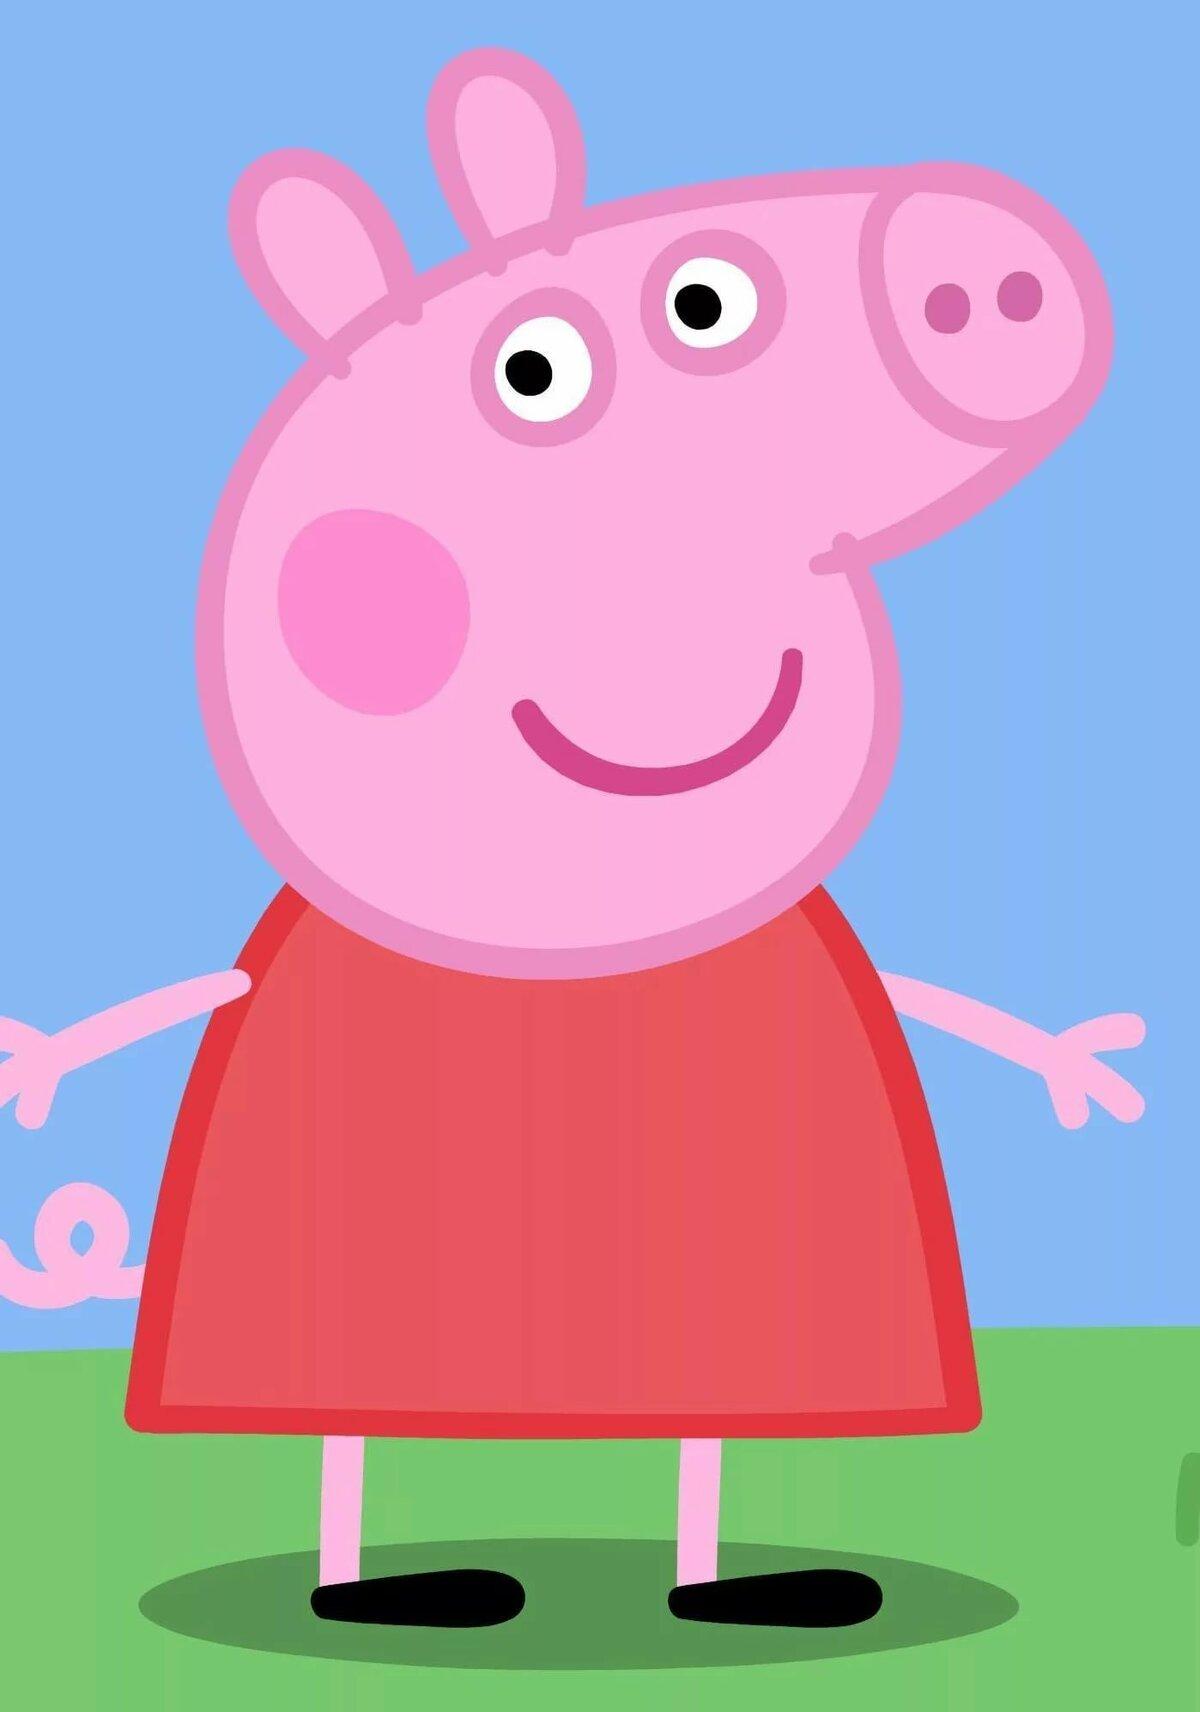 москва, картинки свинка пеппа красивые тем менее